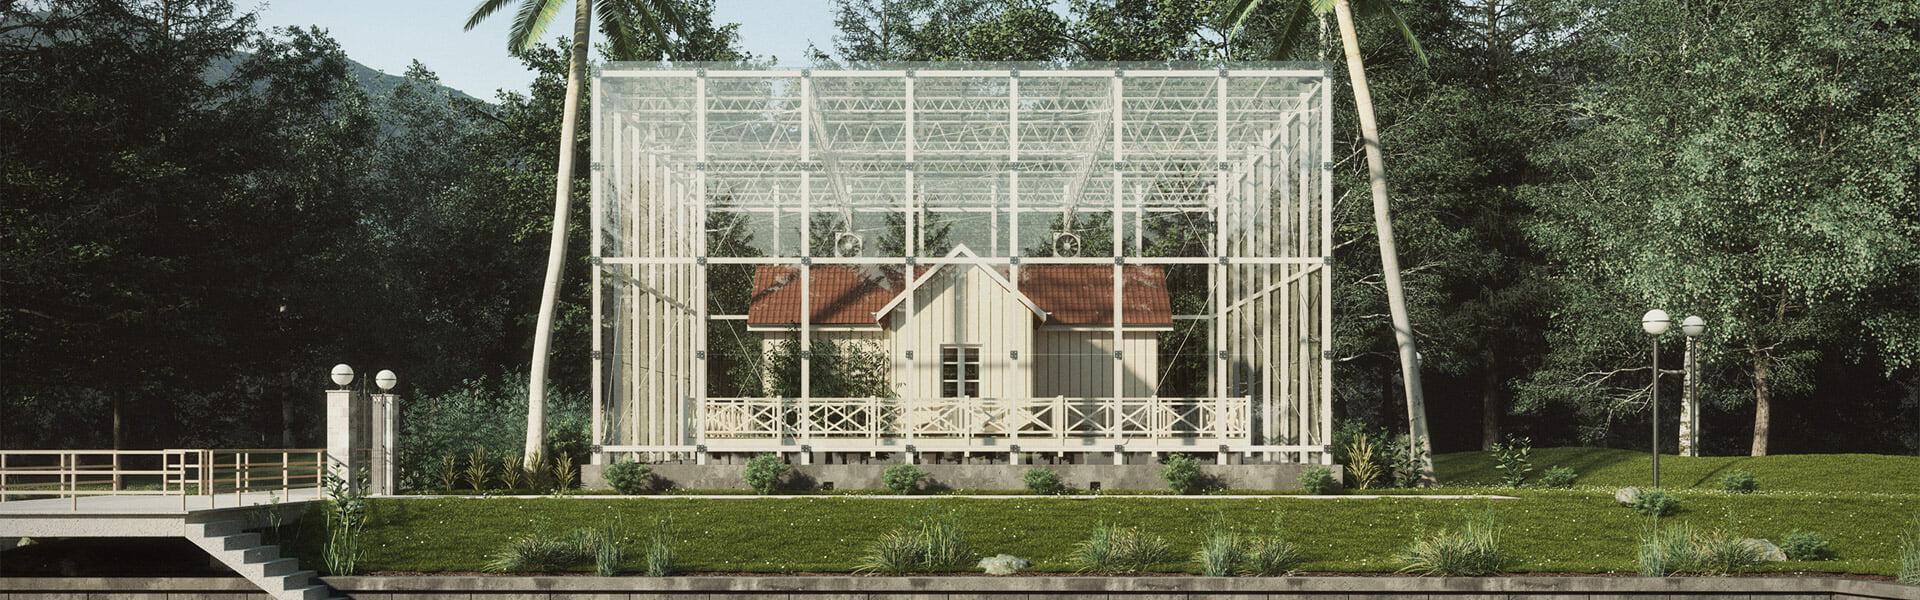 David santos sarmiento museum architecture vray skecthup 01 1920x600px.